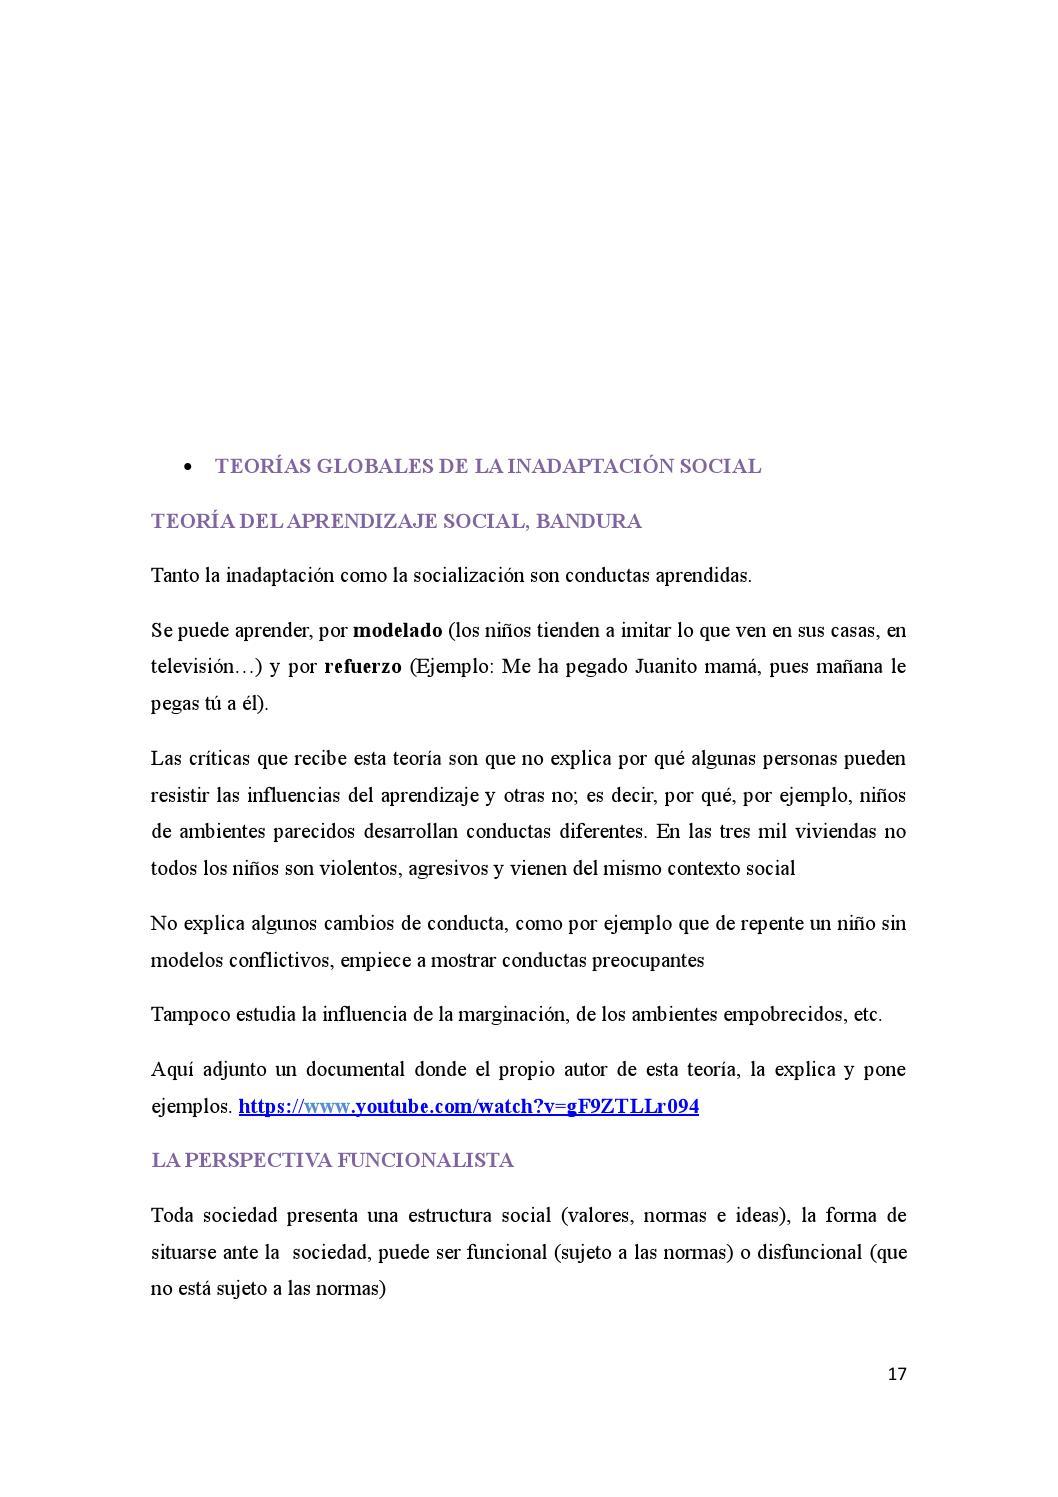 Portafolio De Intervencion By Reme López Mariscal Issuu